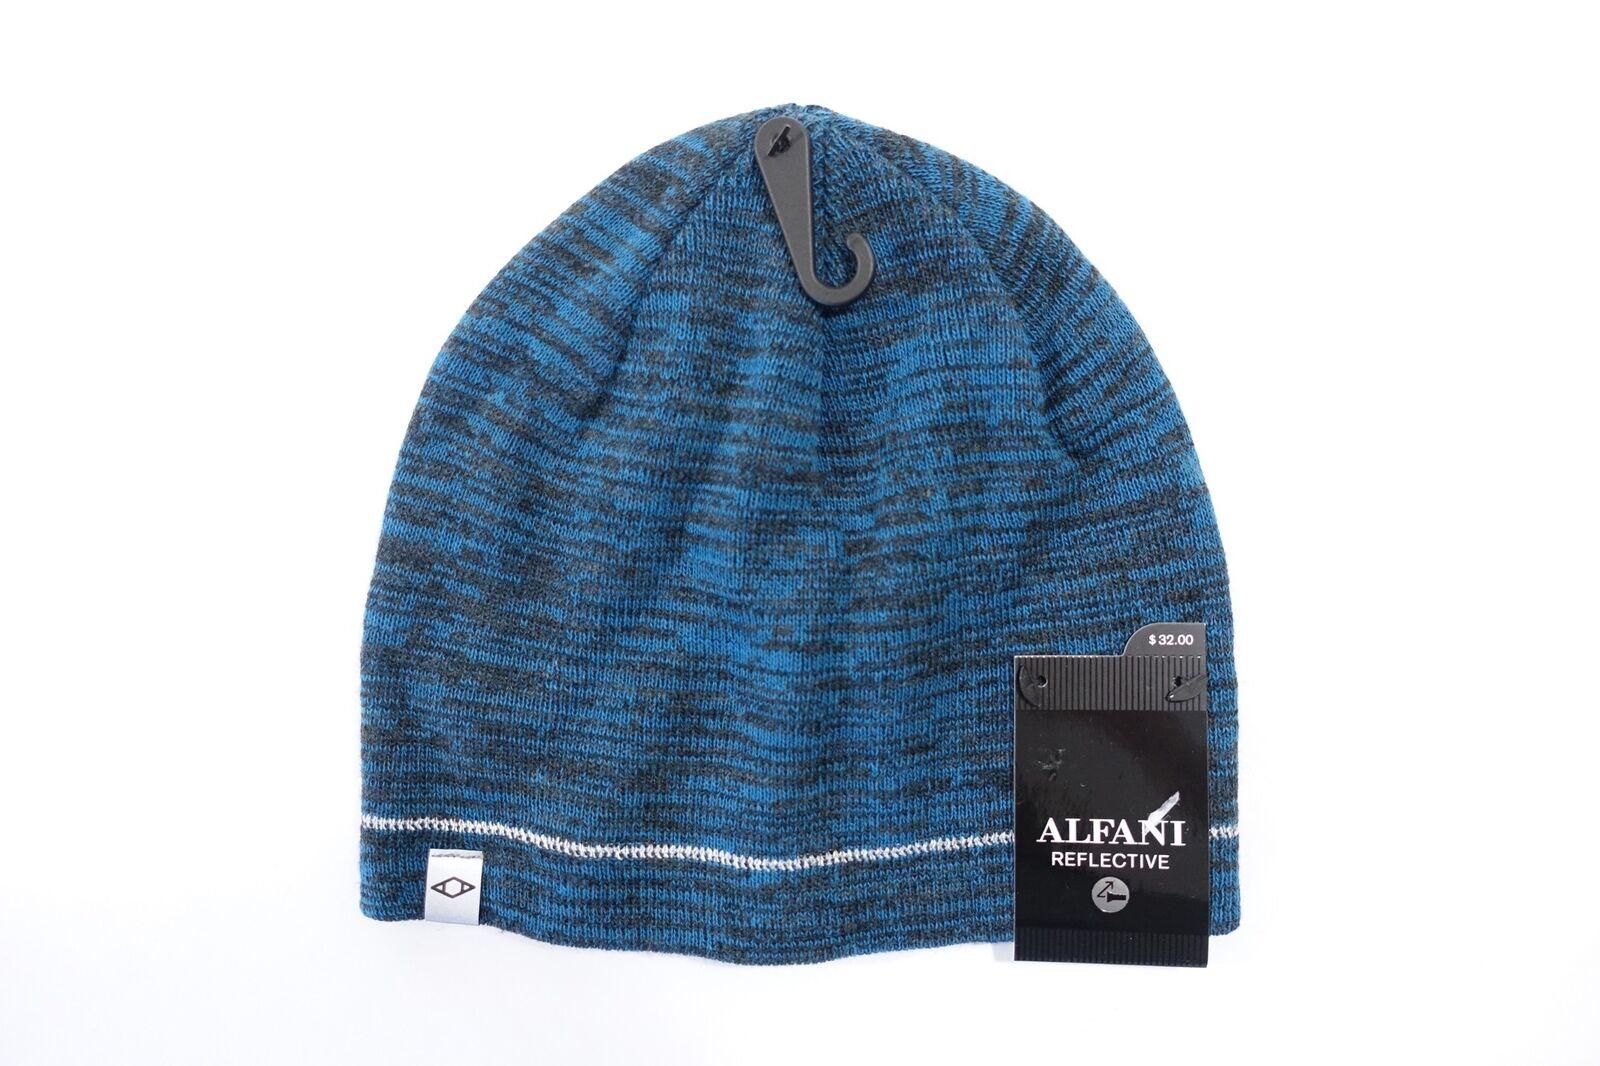 Alfani Reflective Blue Grey One Size otenkopf Hat Knitted Mens NWT